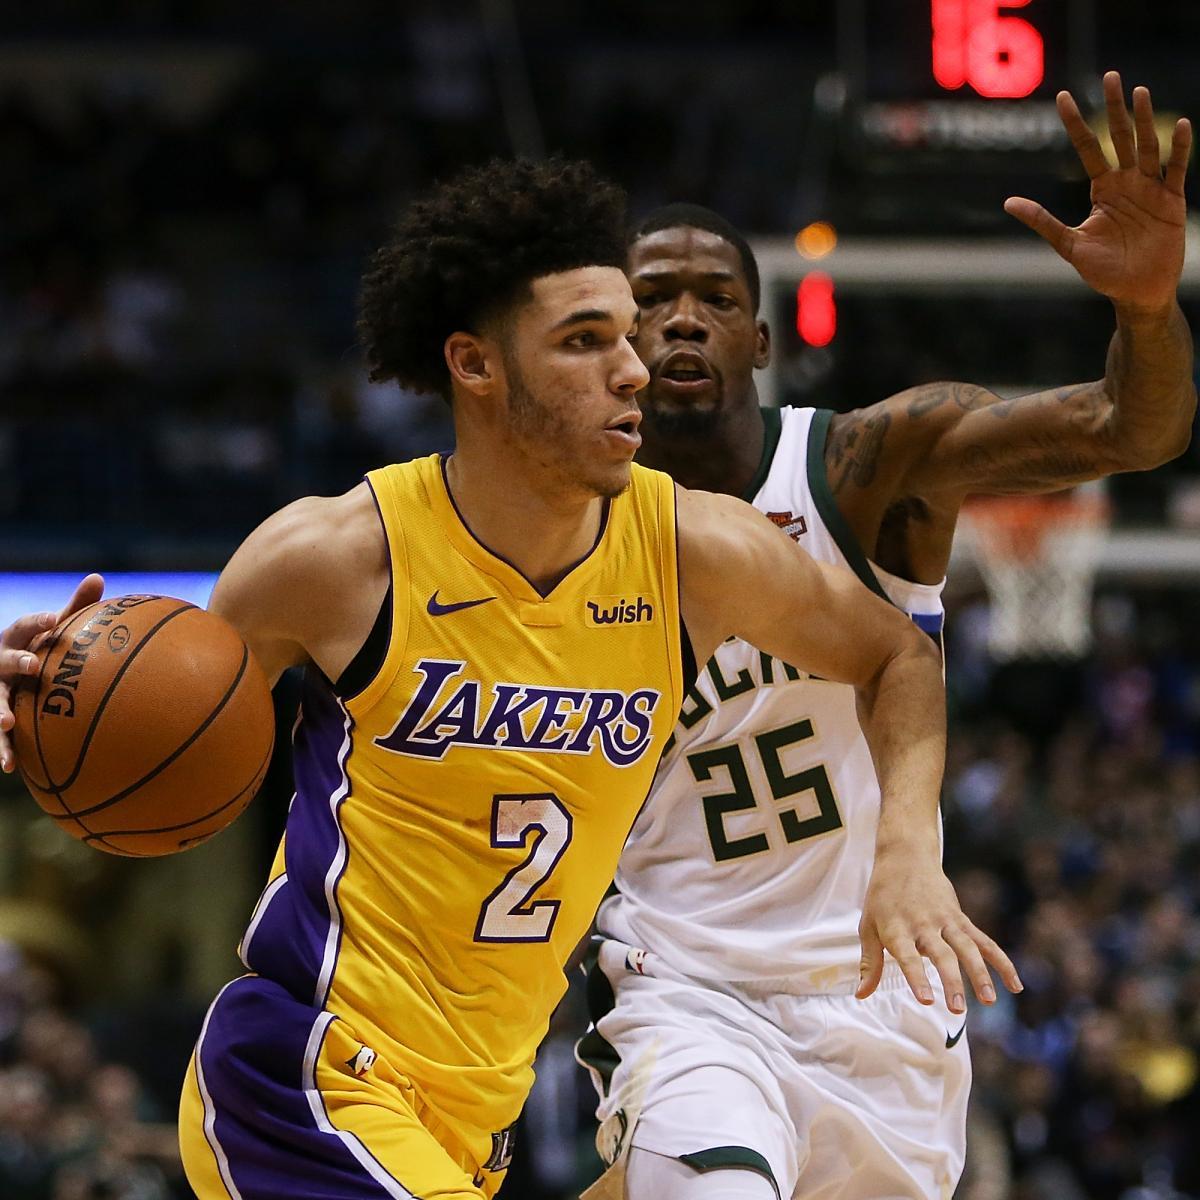 Lakers News: Lonzo Ball, Luke Walton Discuss Rookie's